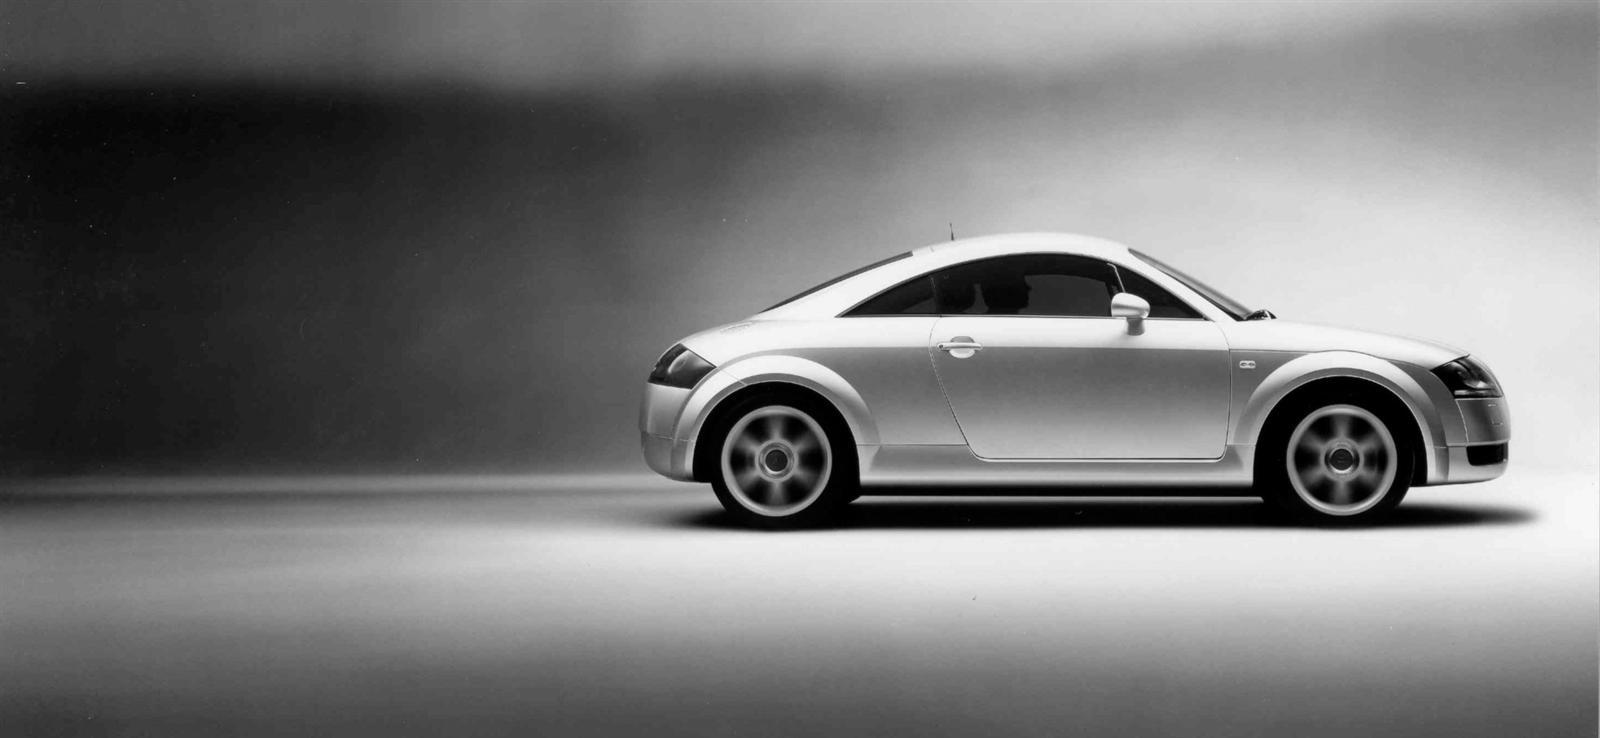 2000 Audi Tt Image Photo 2 Of 13